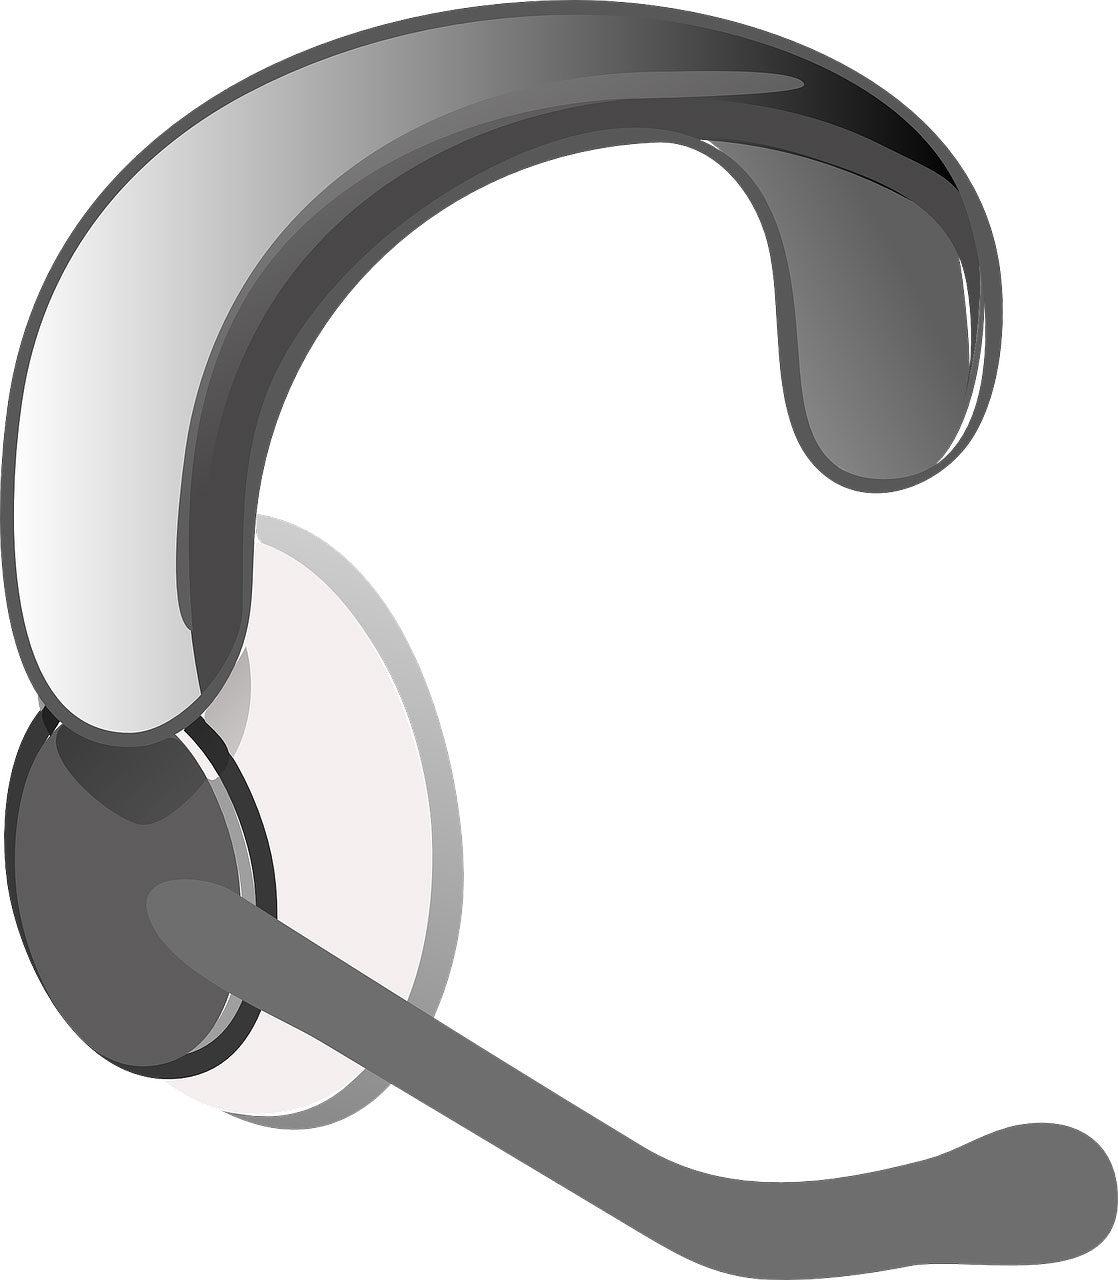 Site image (Headset, Receptionist, Helpdesk)